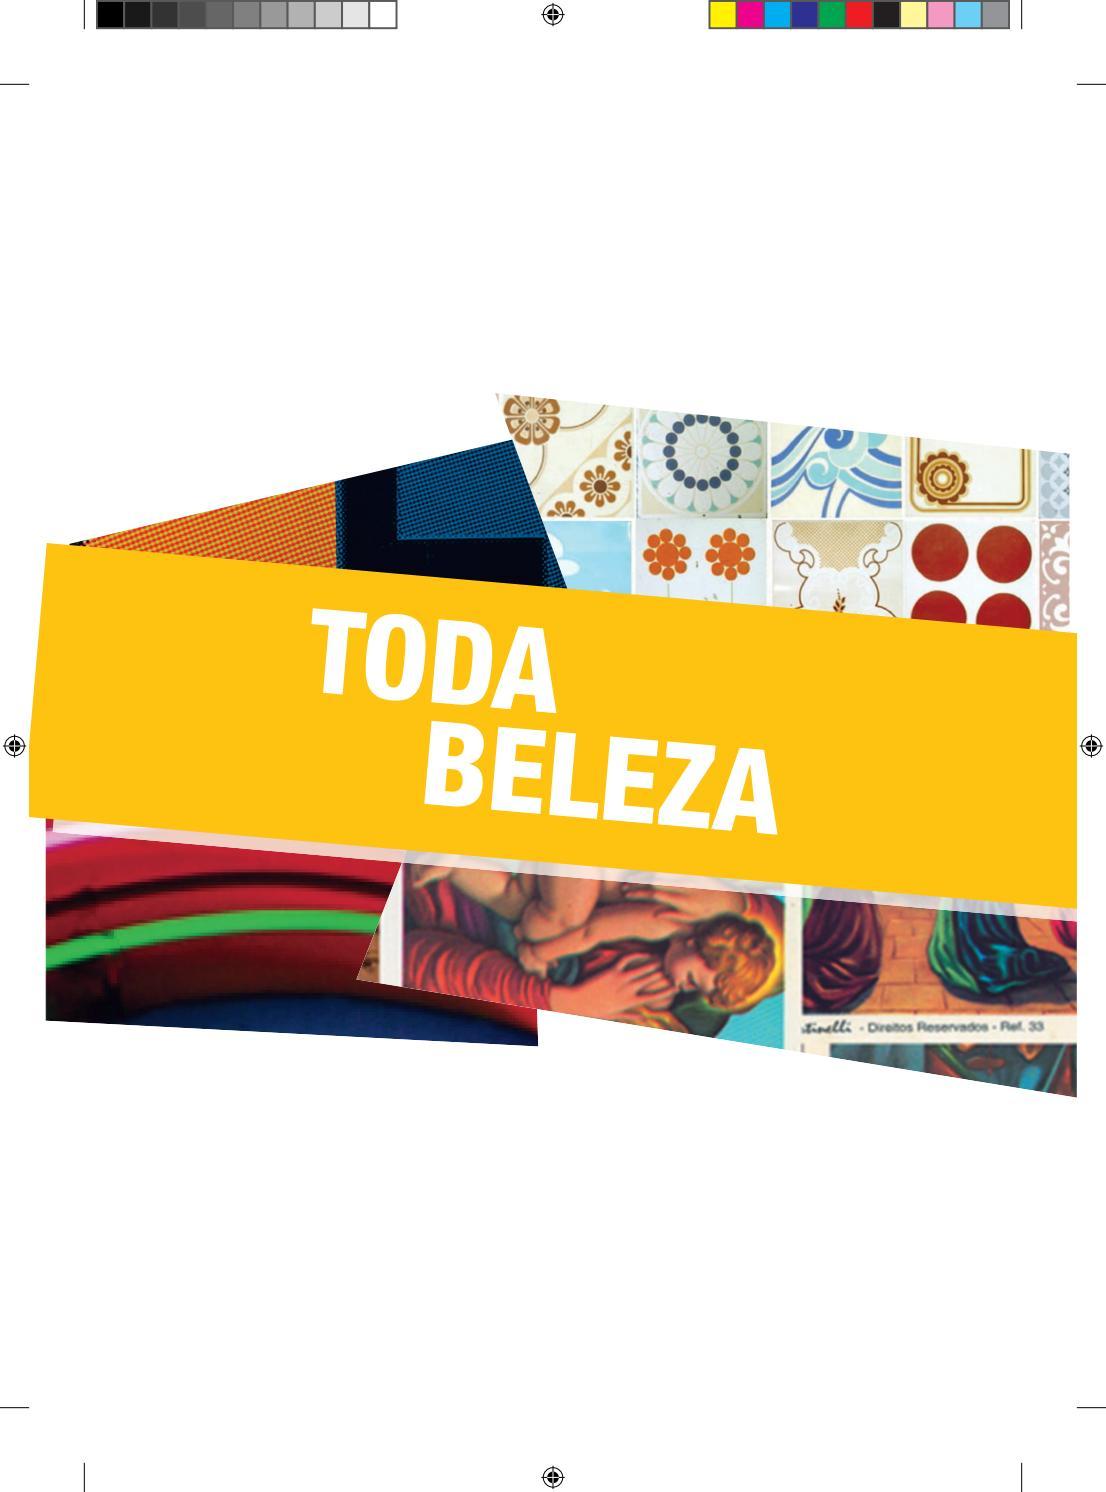 f43c0f2829f75 Maleta Toda Beleza - caderno by canalfutura - issuu